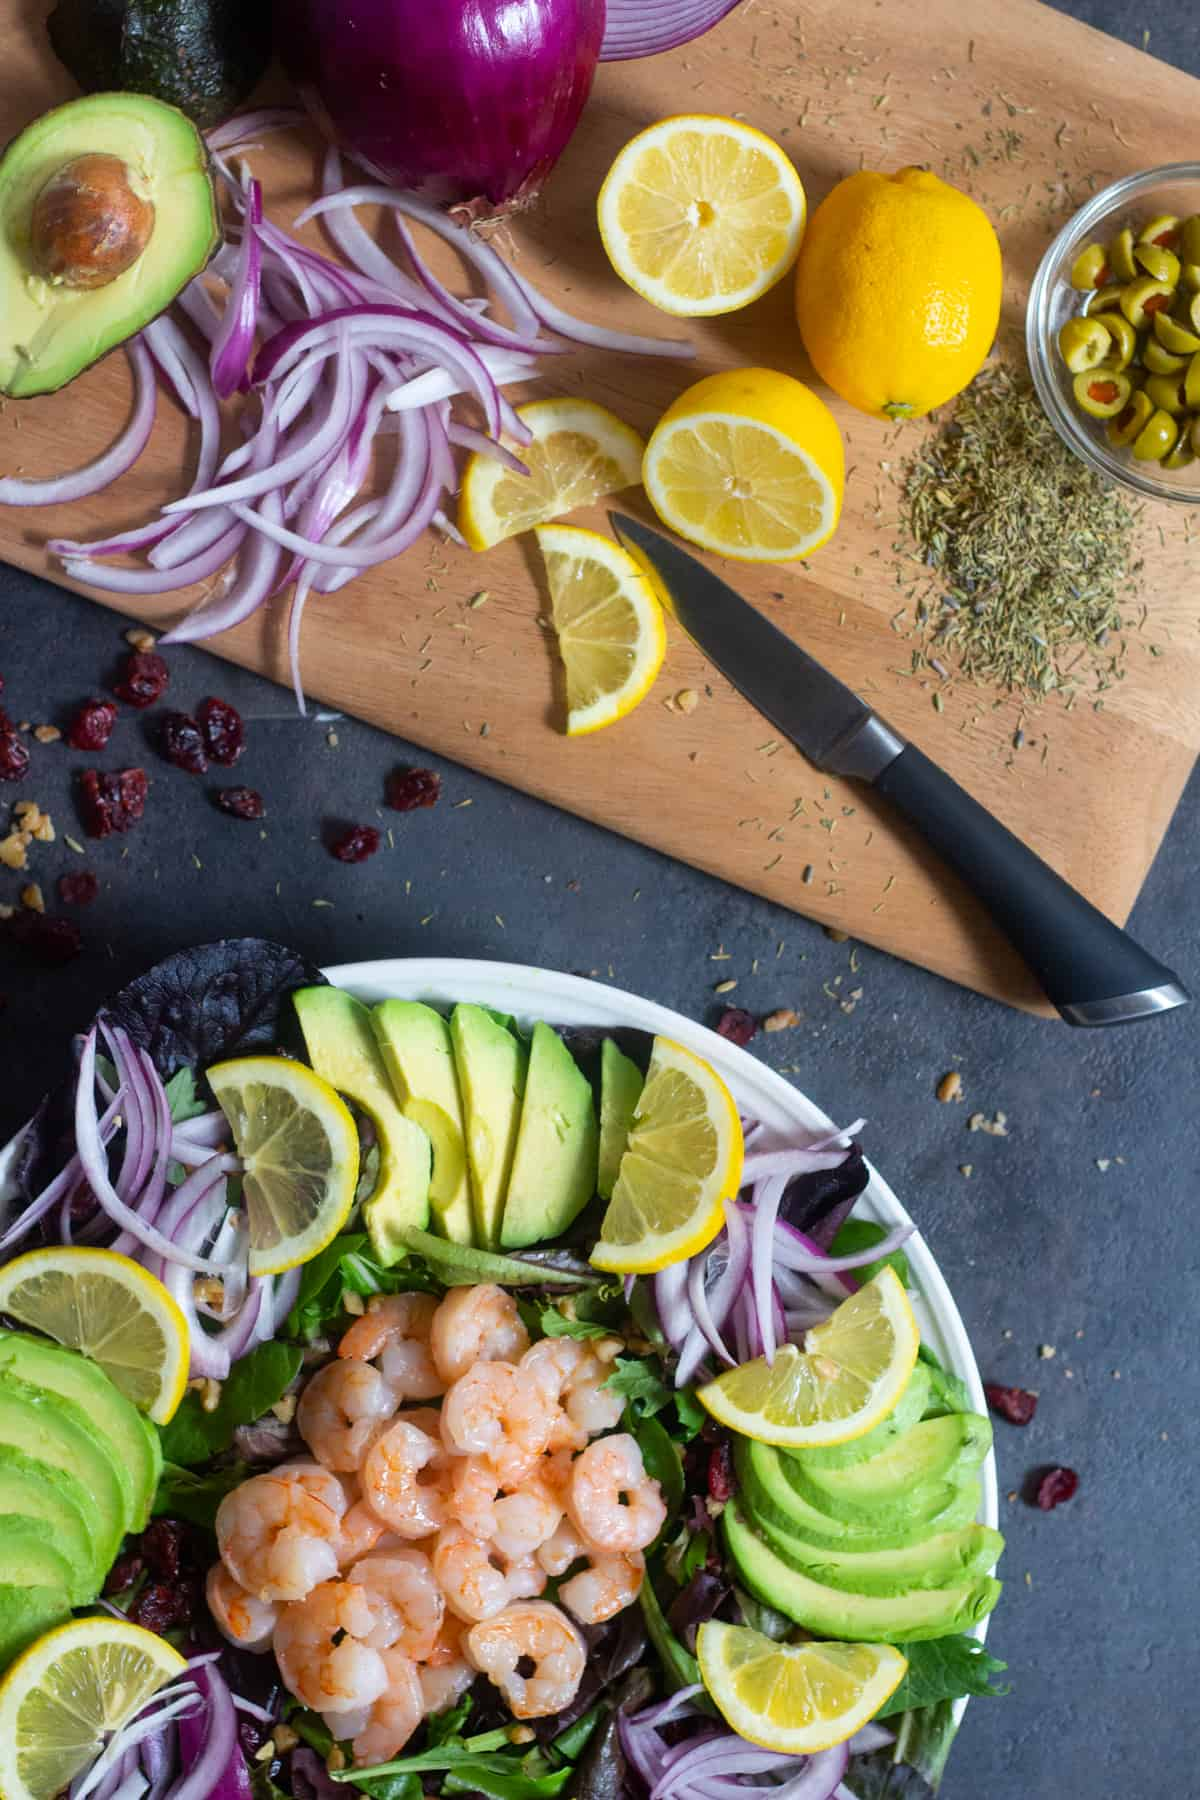 This avocado shrimp salad is best served fresh.